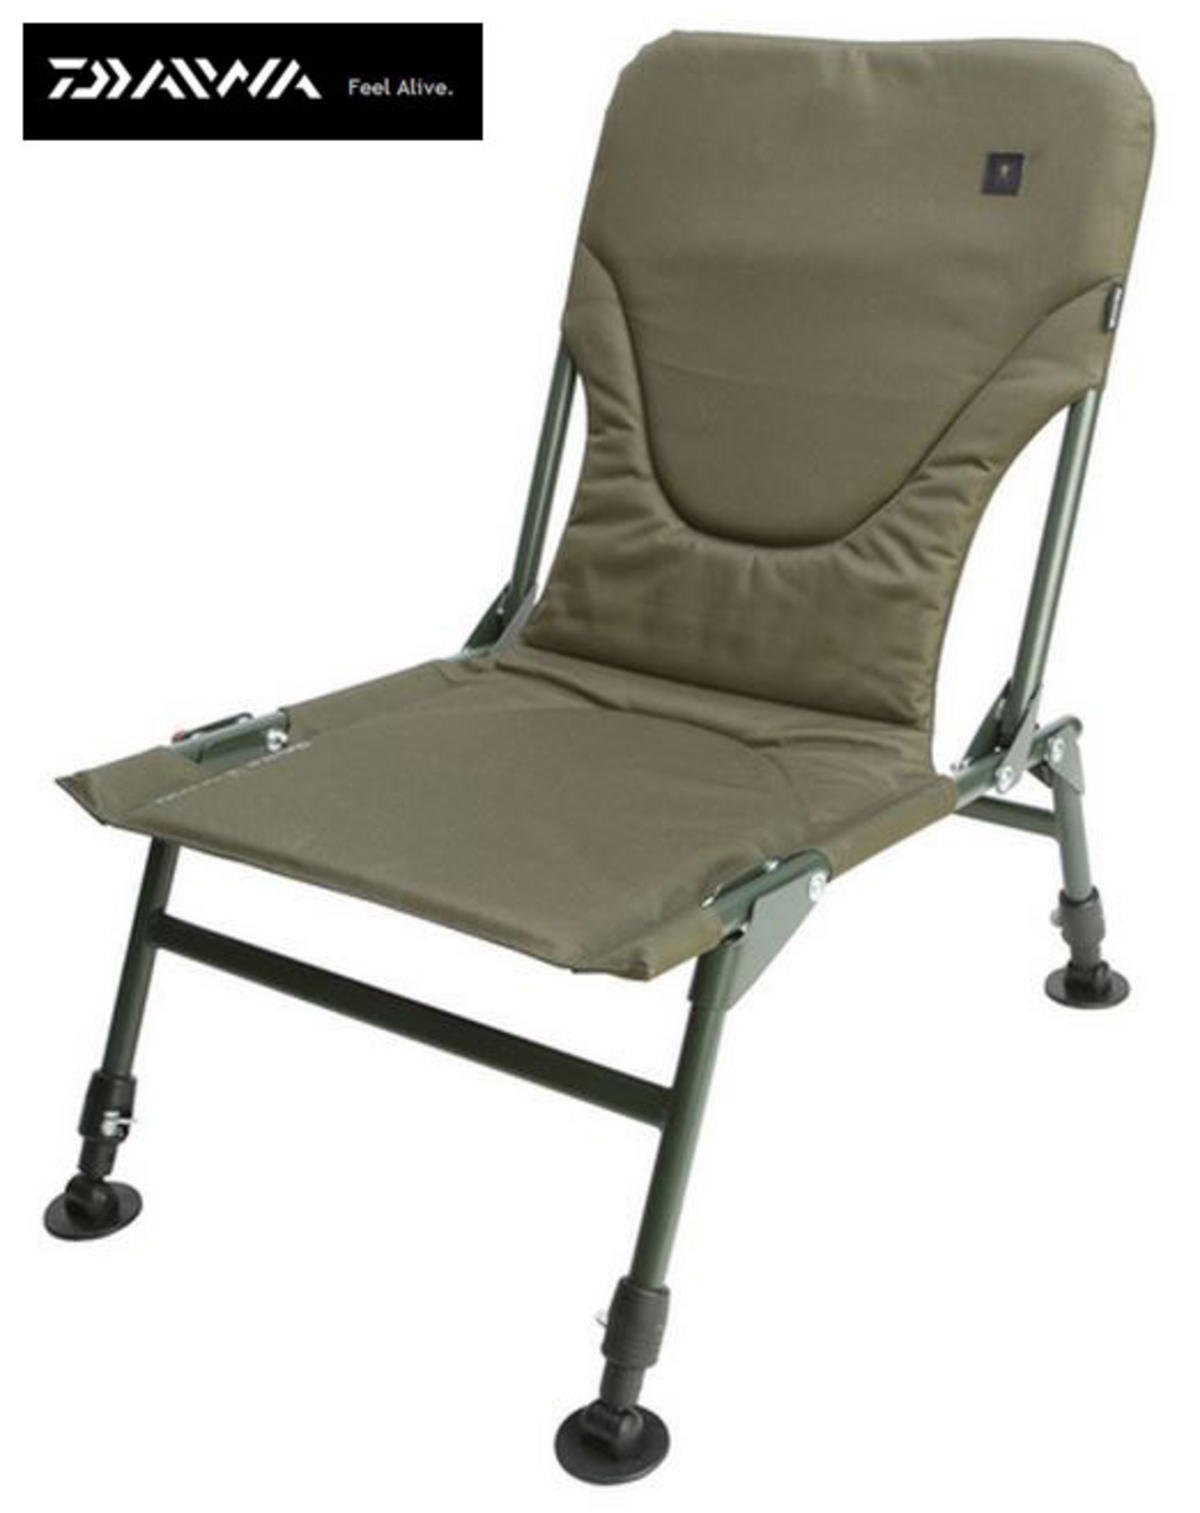 daiwa fishing chair bo concept chairs new black widow carp bwcc1 mad